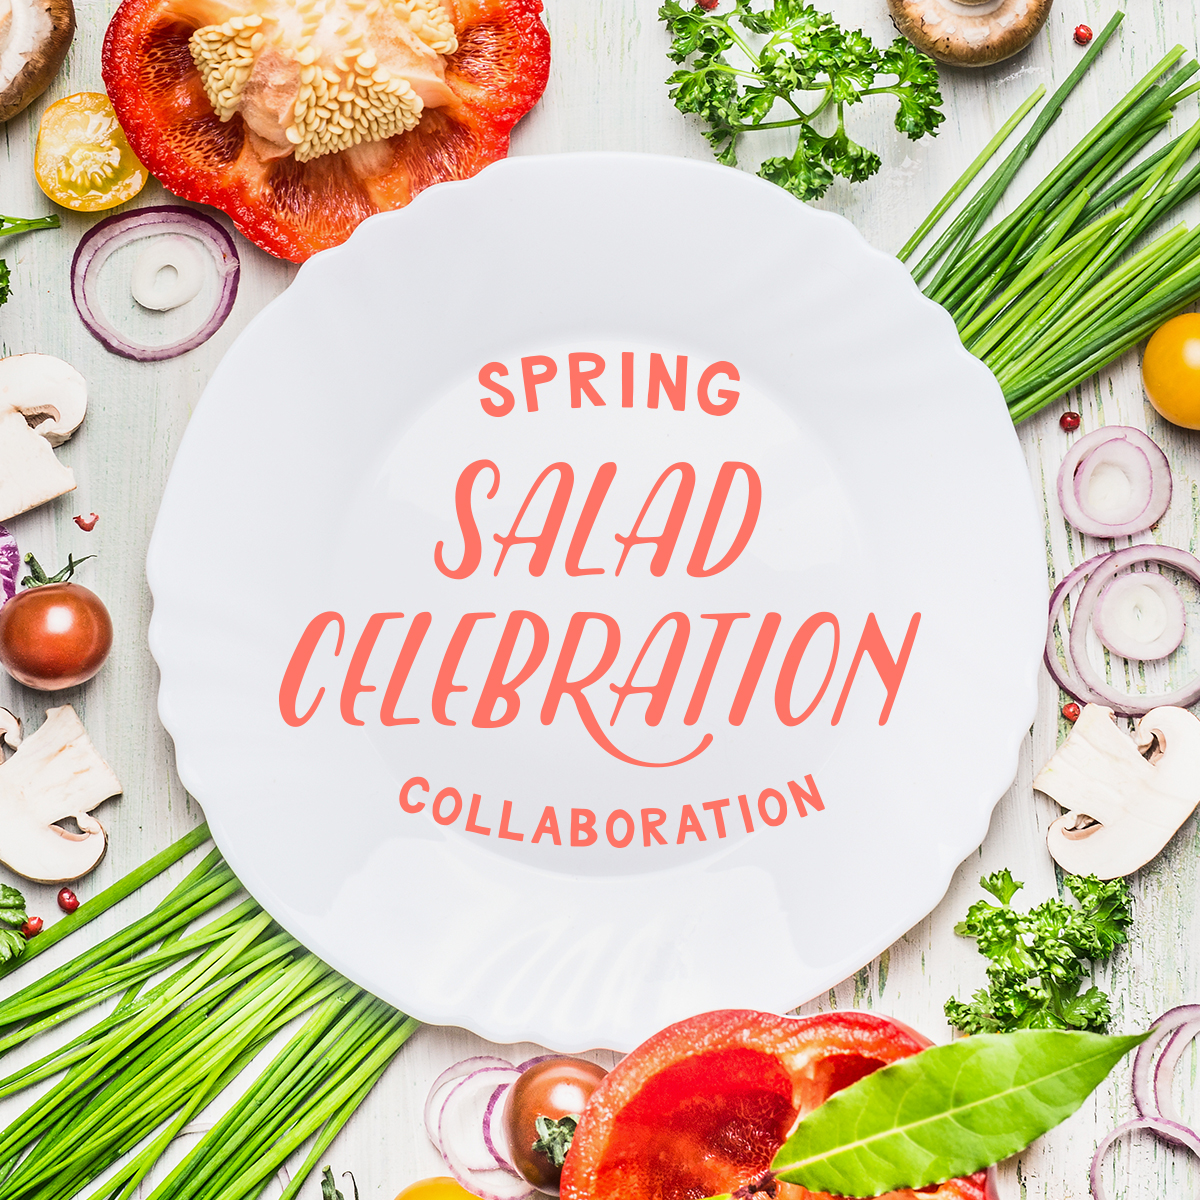 12 Delicious Salad Recipes for Spring